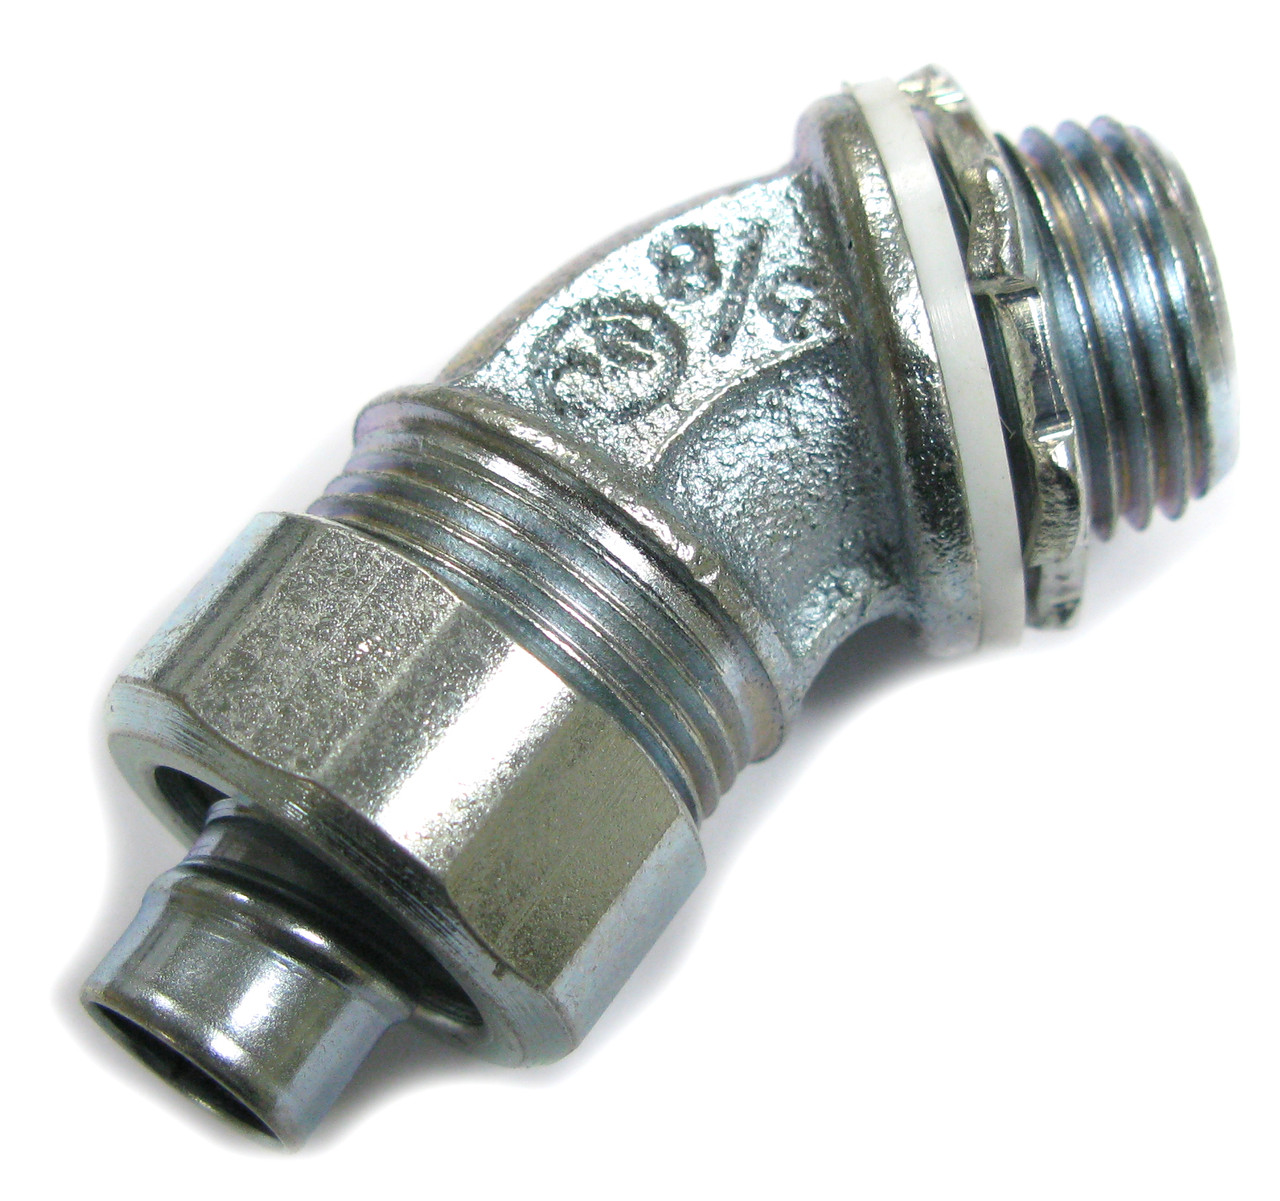 Amfi 45 Degree Elbow Sealtite Liquidtight Fitting, 3/4 Inch USA